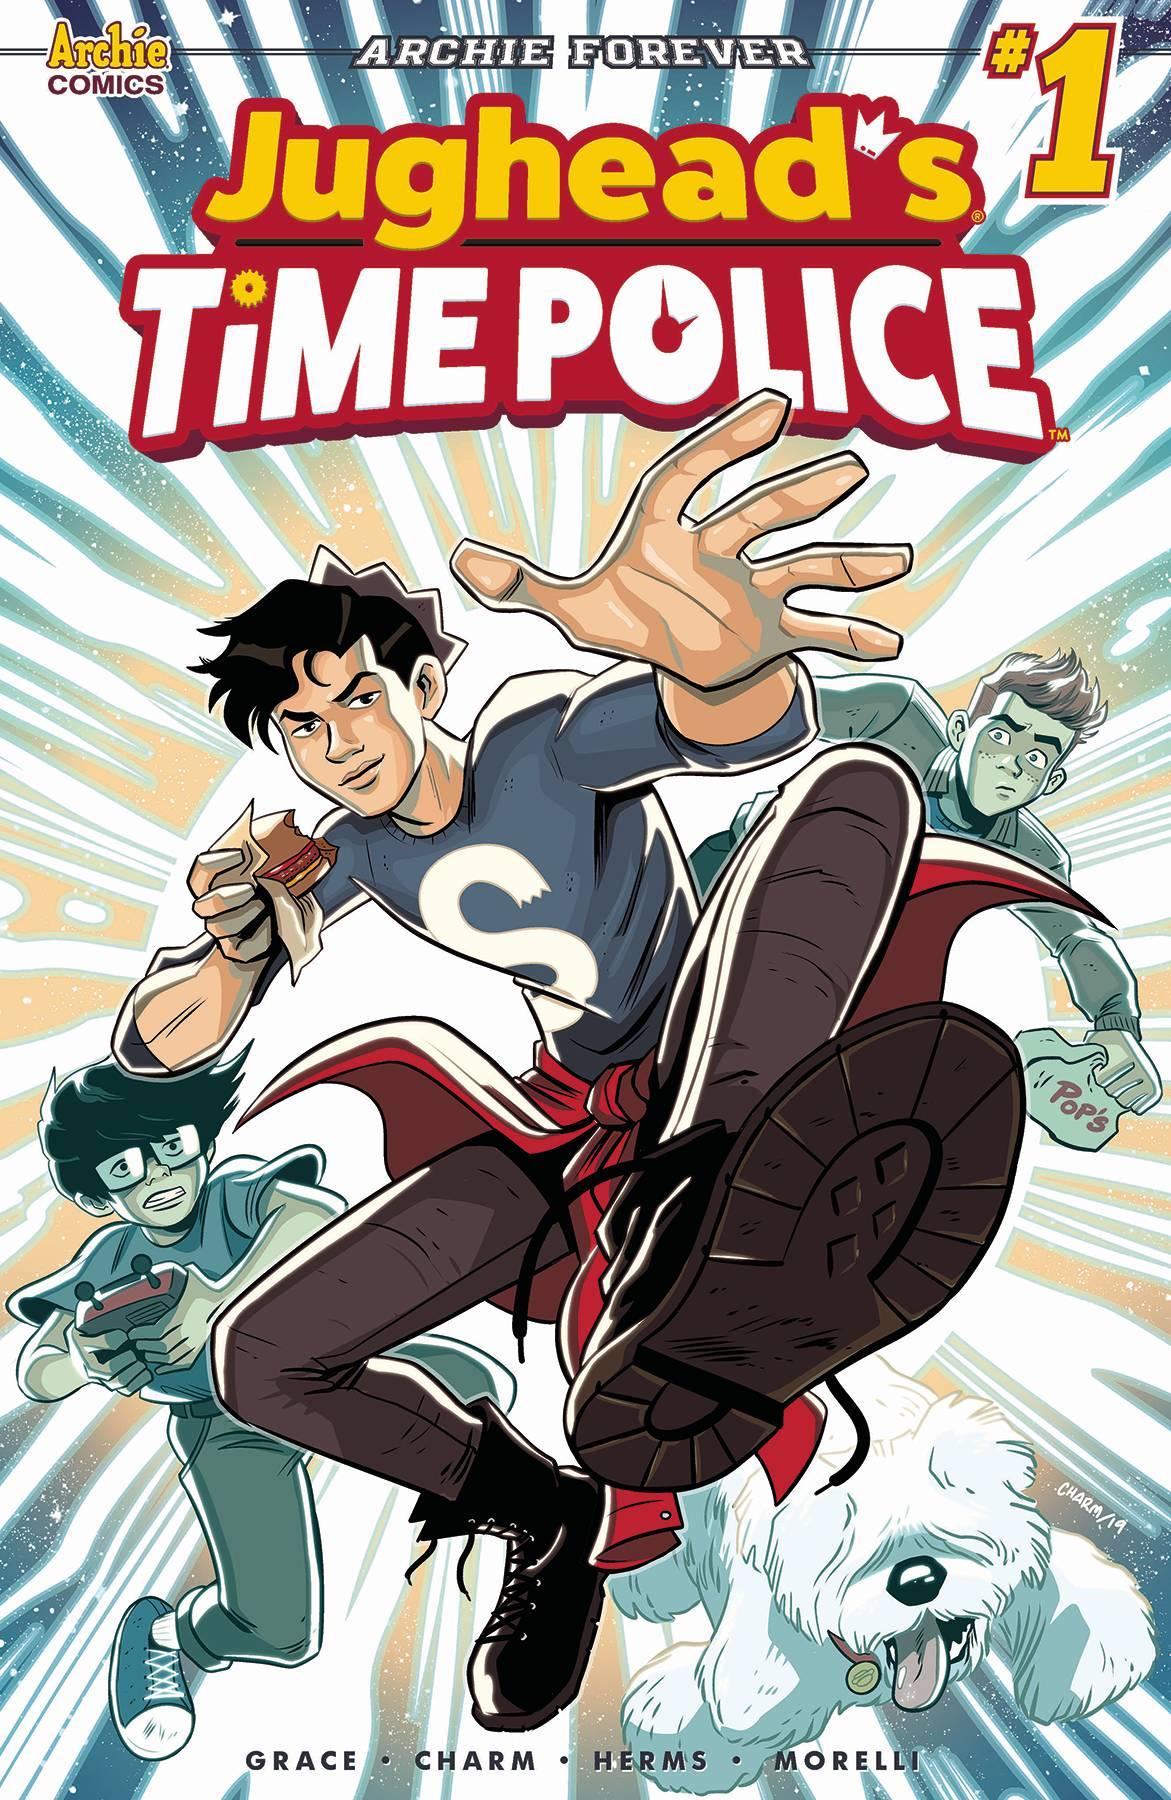 JUGHEAD TIME POLICE #1